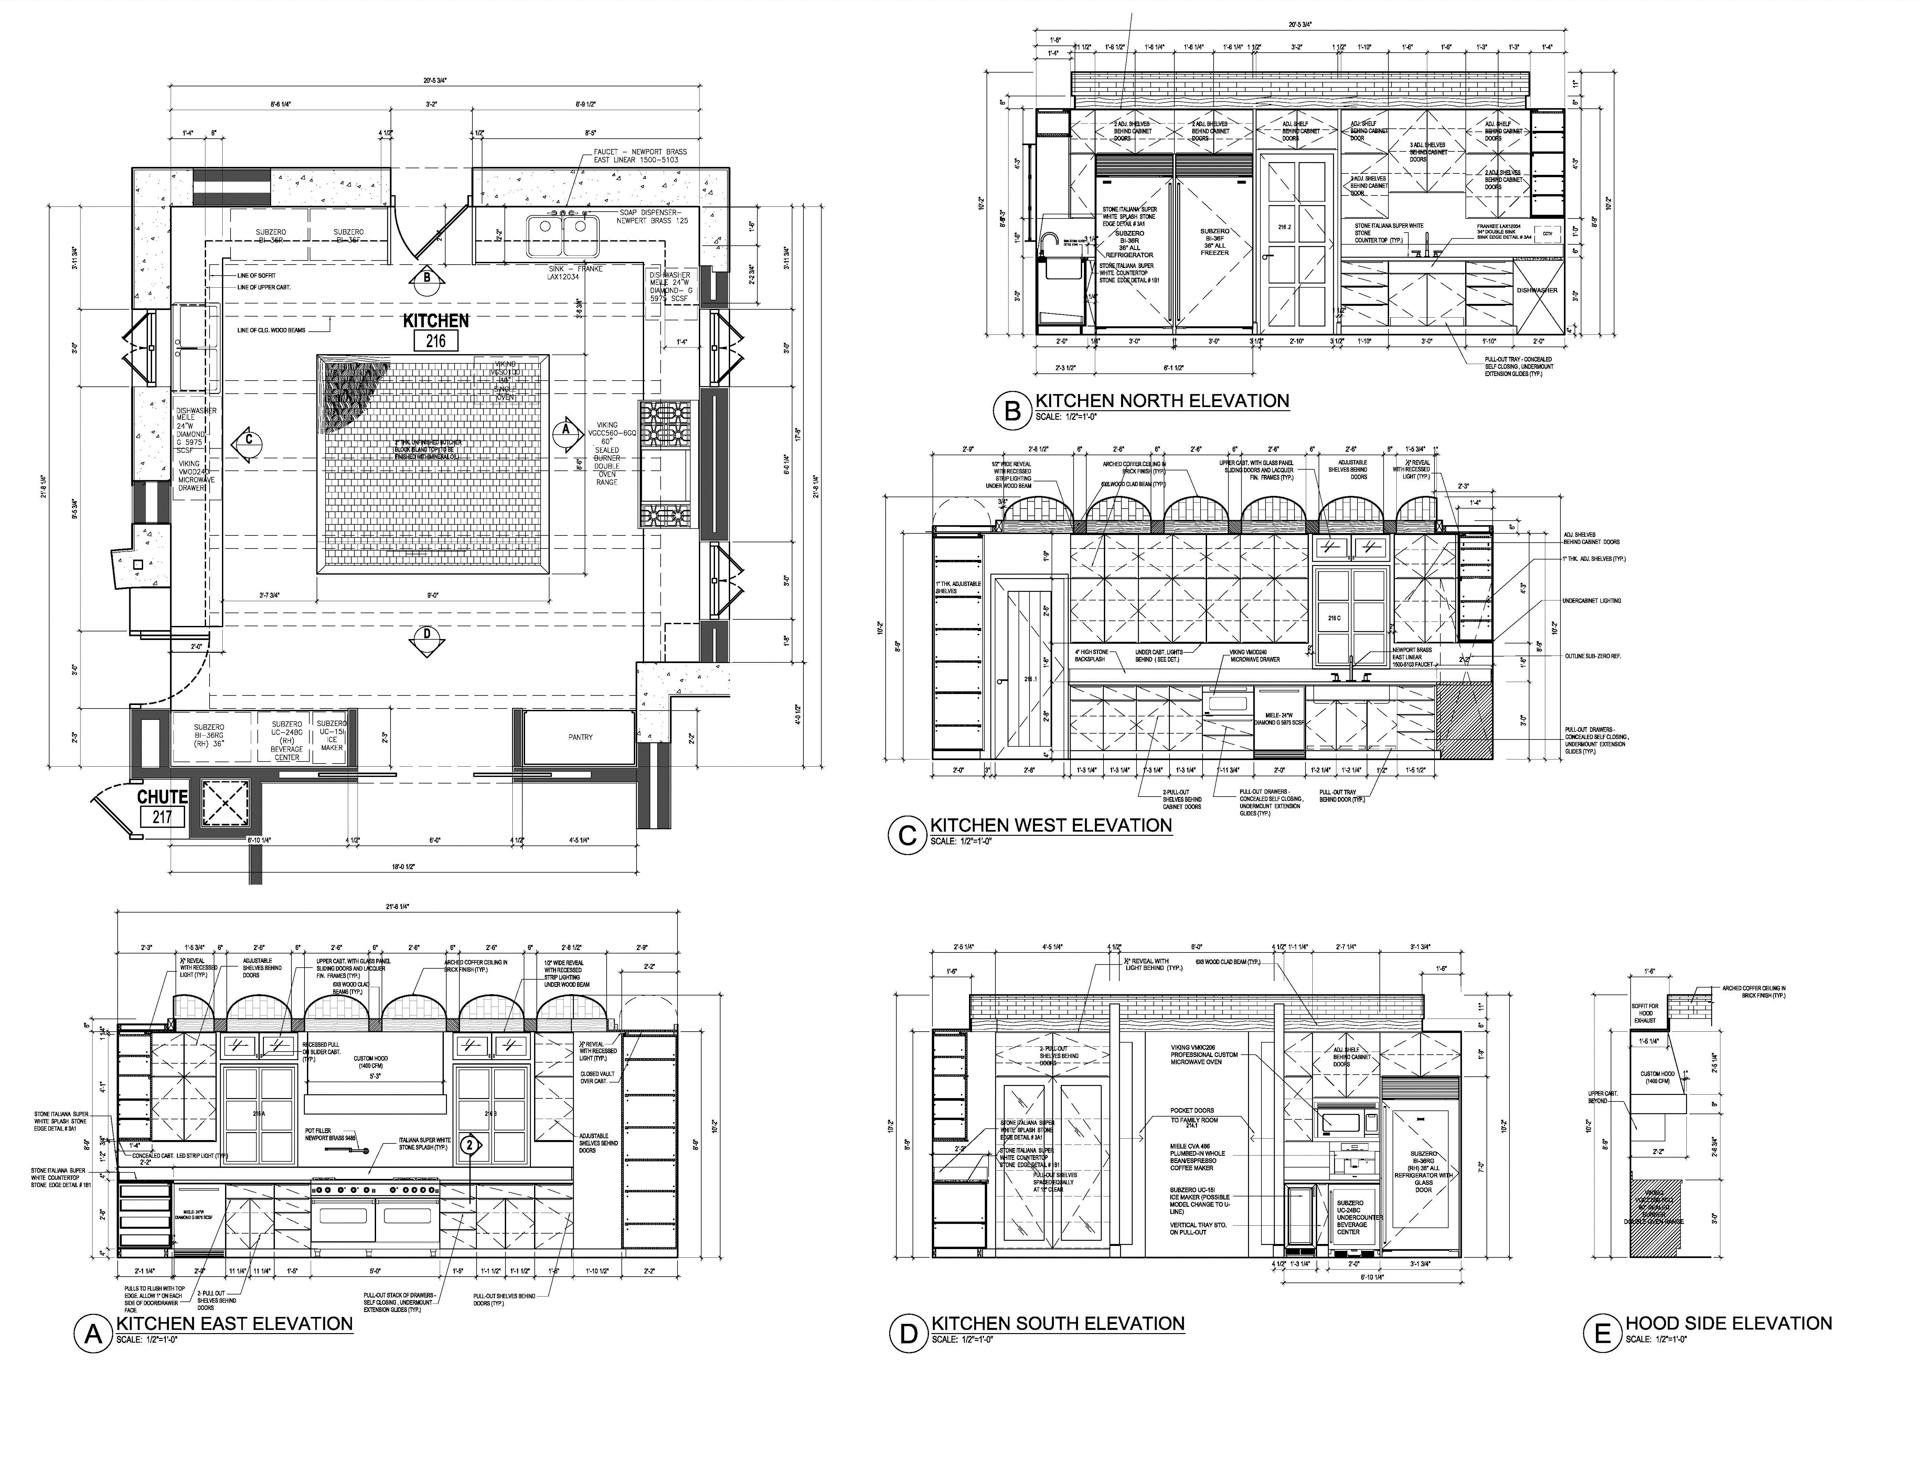 Interior Details Akia Drafting Design